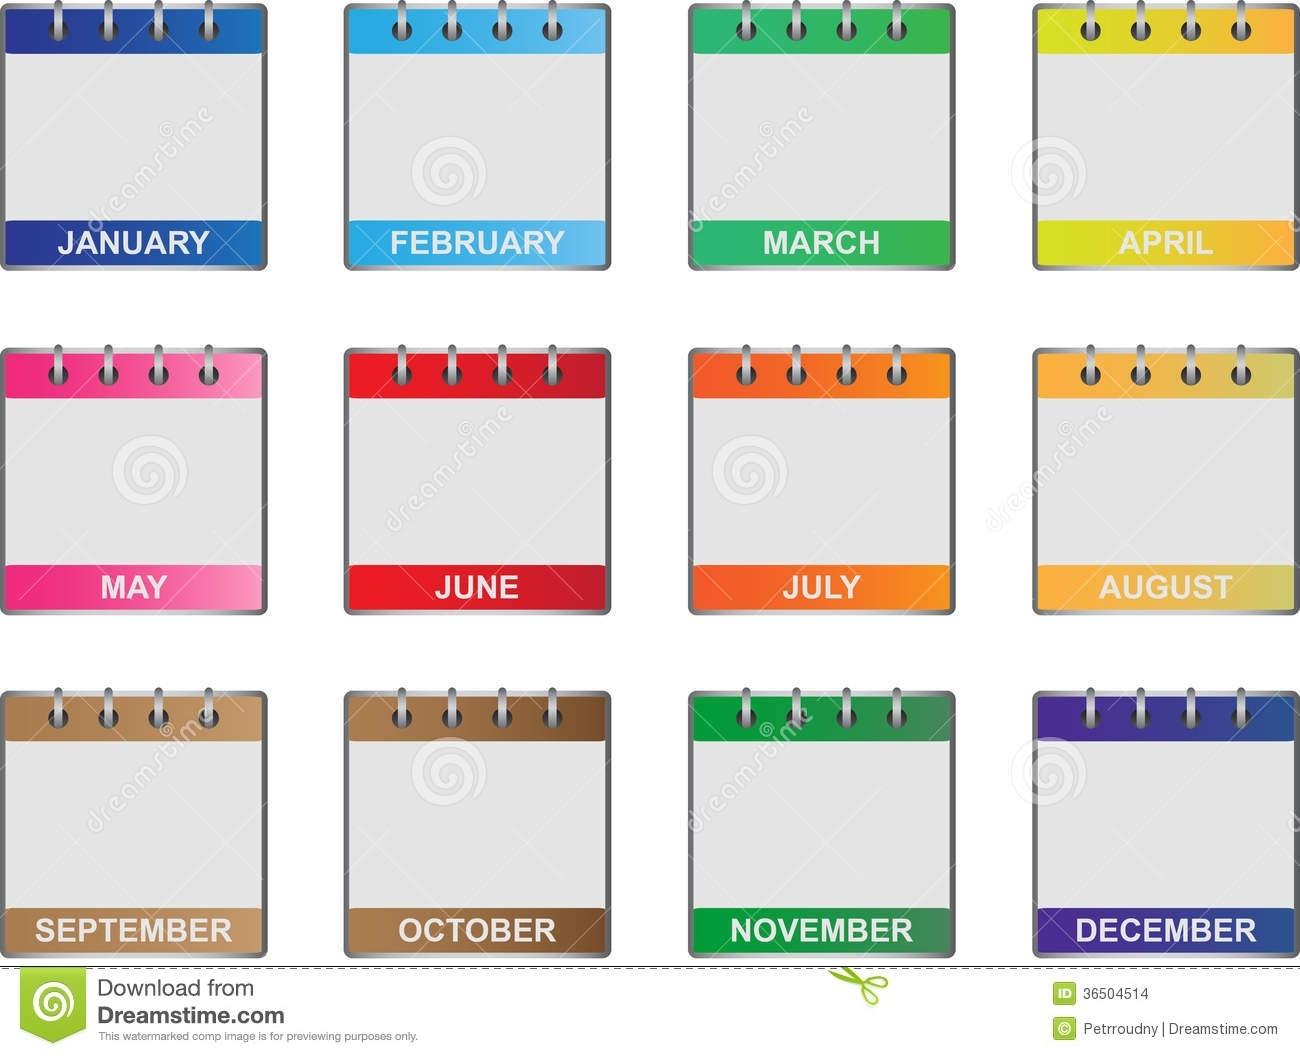 Calendar Icons Set Stock Vector. Illustration Of Illustrations Months Of Year Calendar